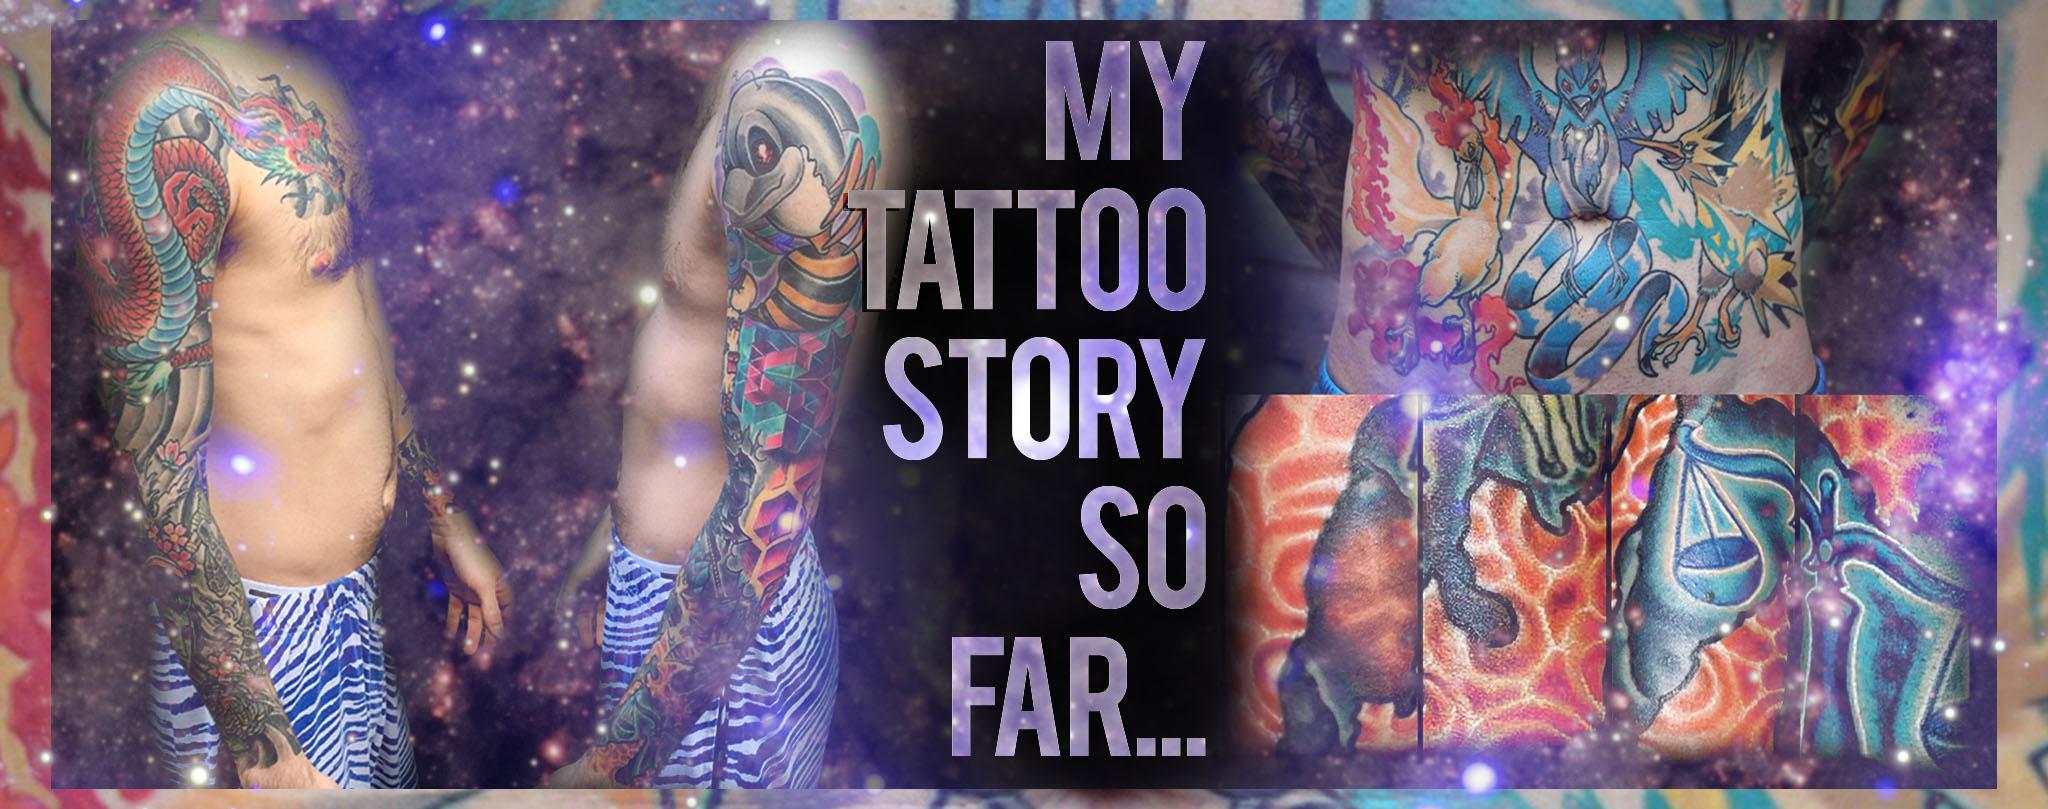 tattoo-story-thumbnail.jpg